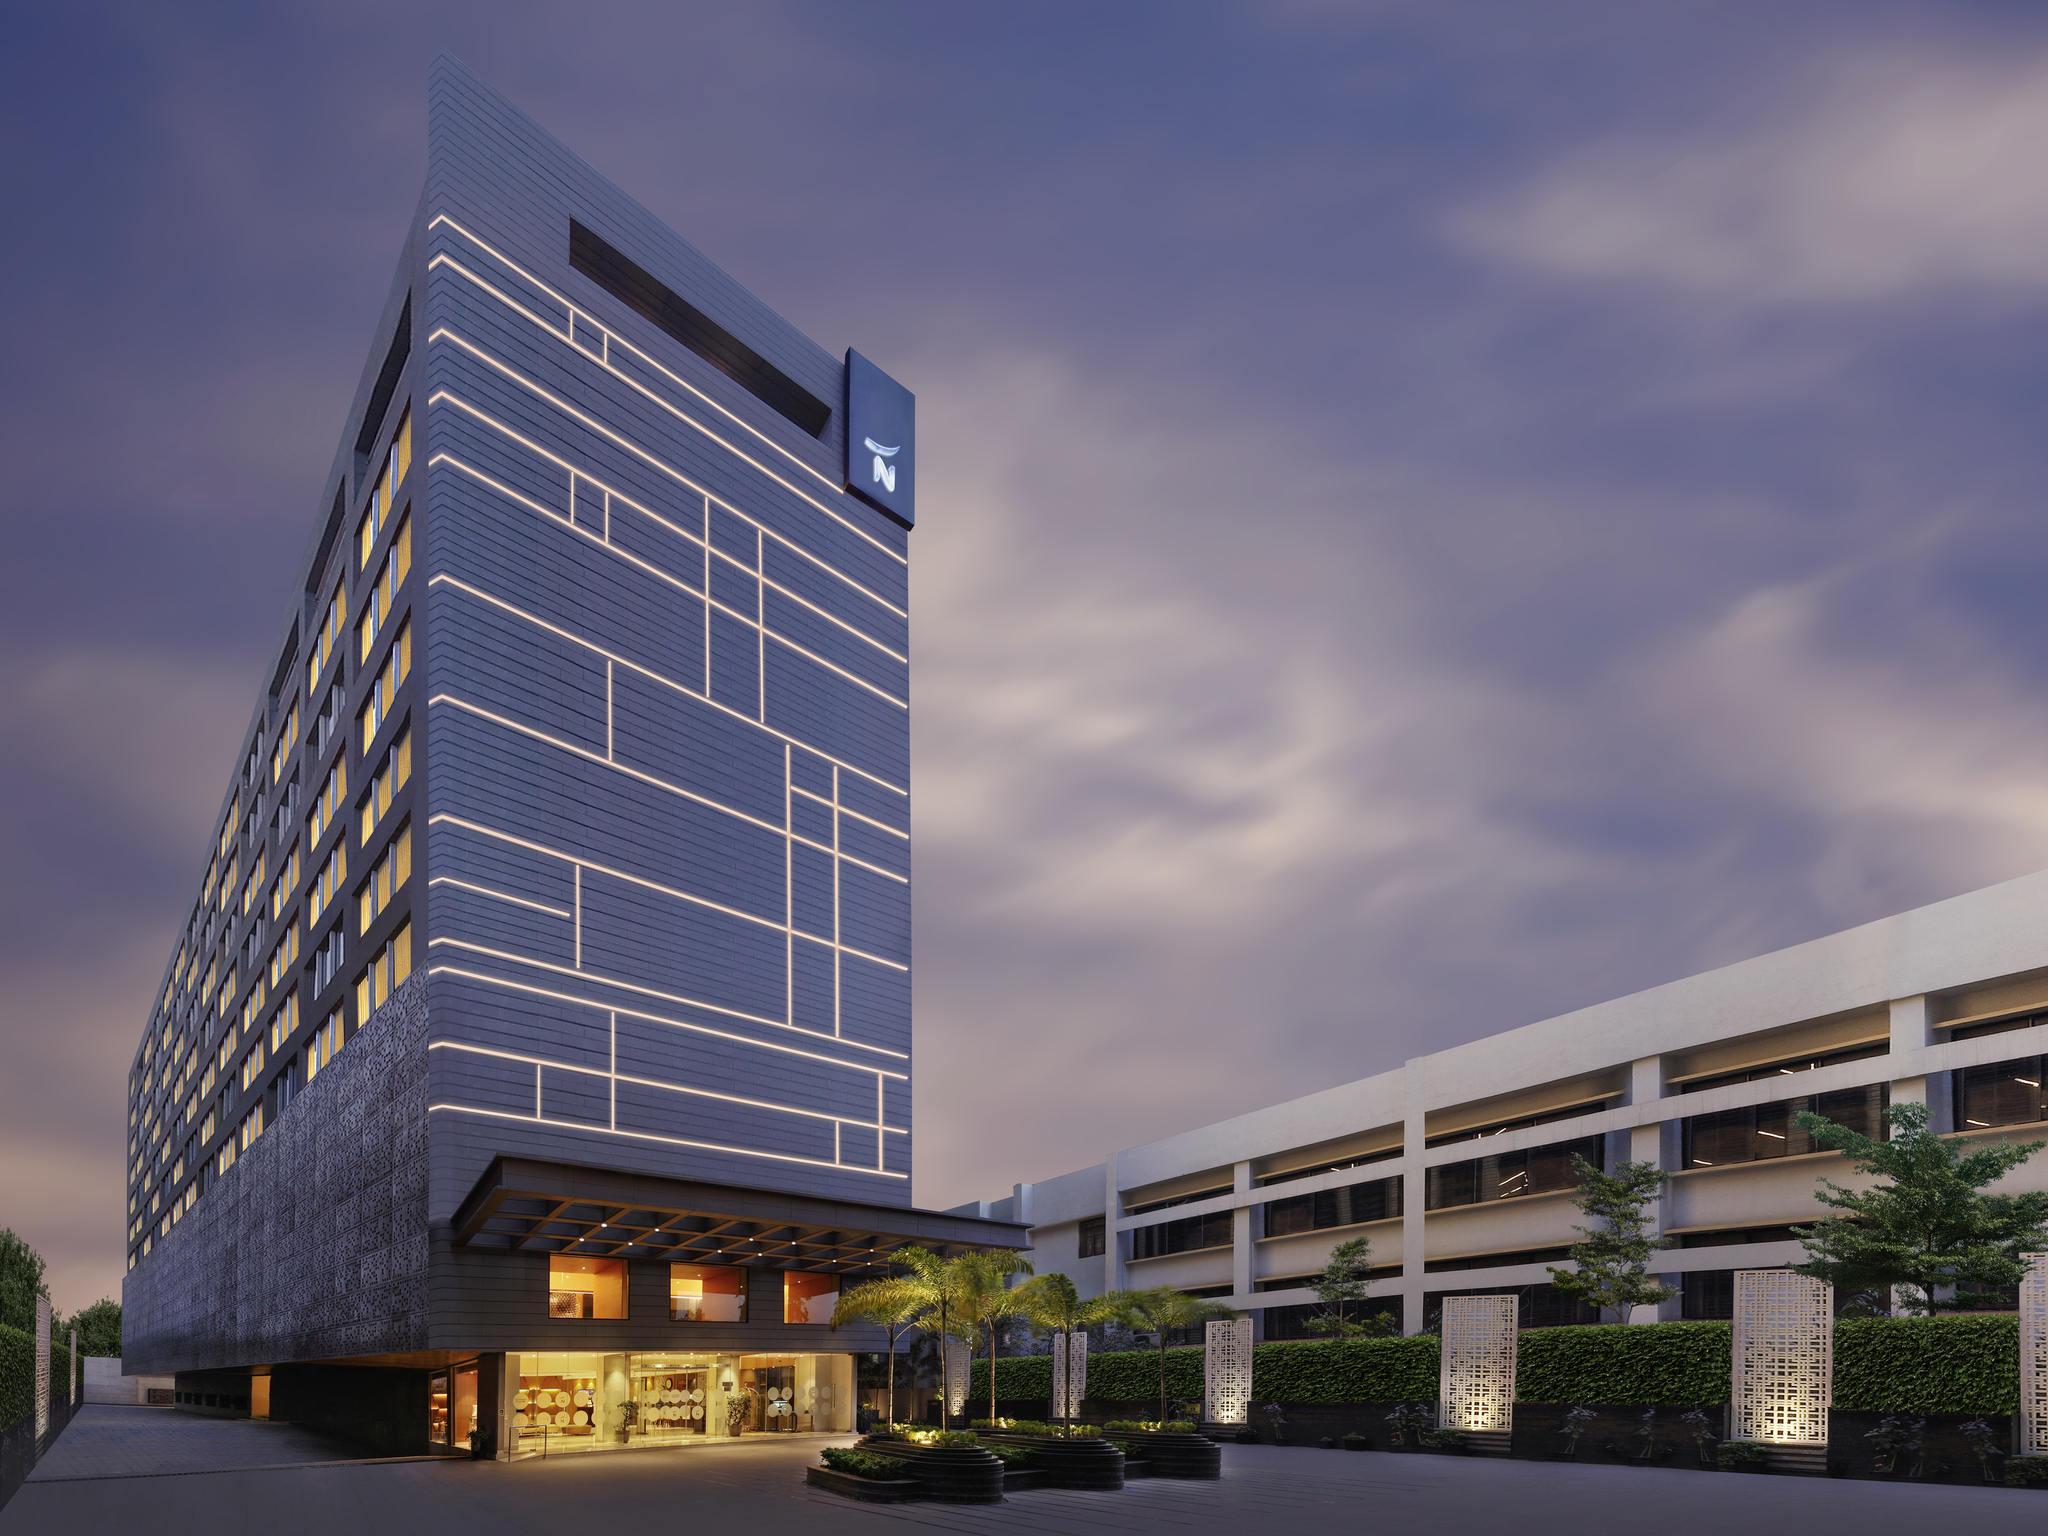 Hotel – Novotel Guwahati GS Road